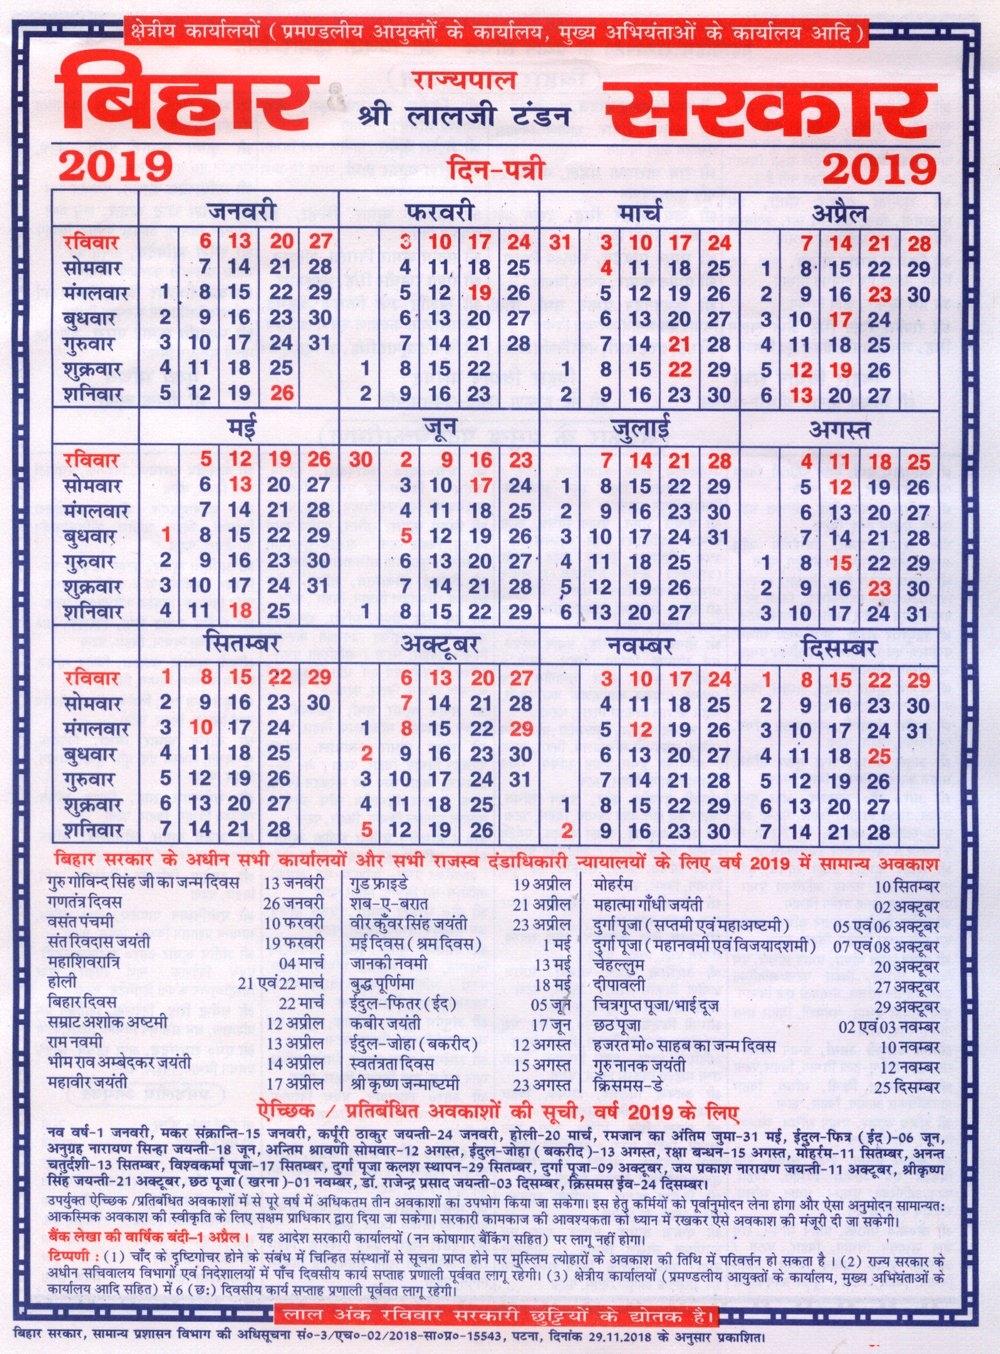 Bihar Govt. Calendar 2019, Bihar Govt. Holiday List, Holiday List Bihar Calendar 2019 Ka Hindi Mein